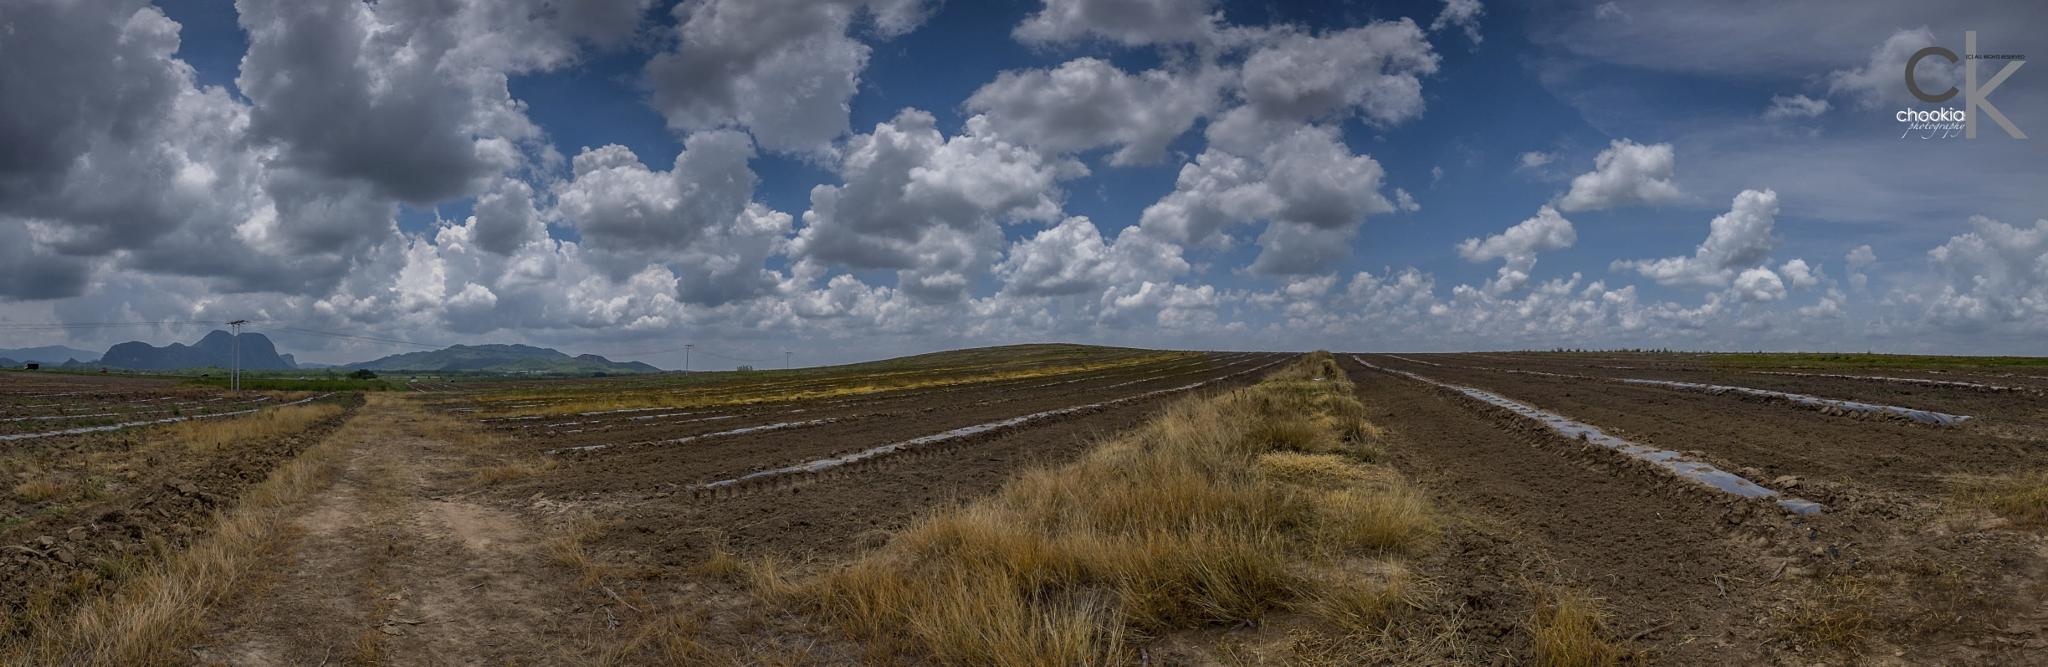 Panorama  by chookia